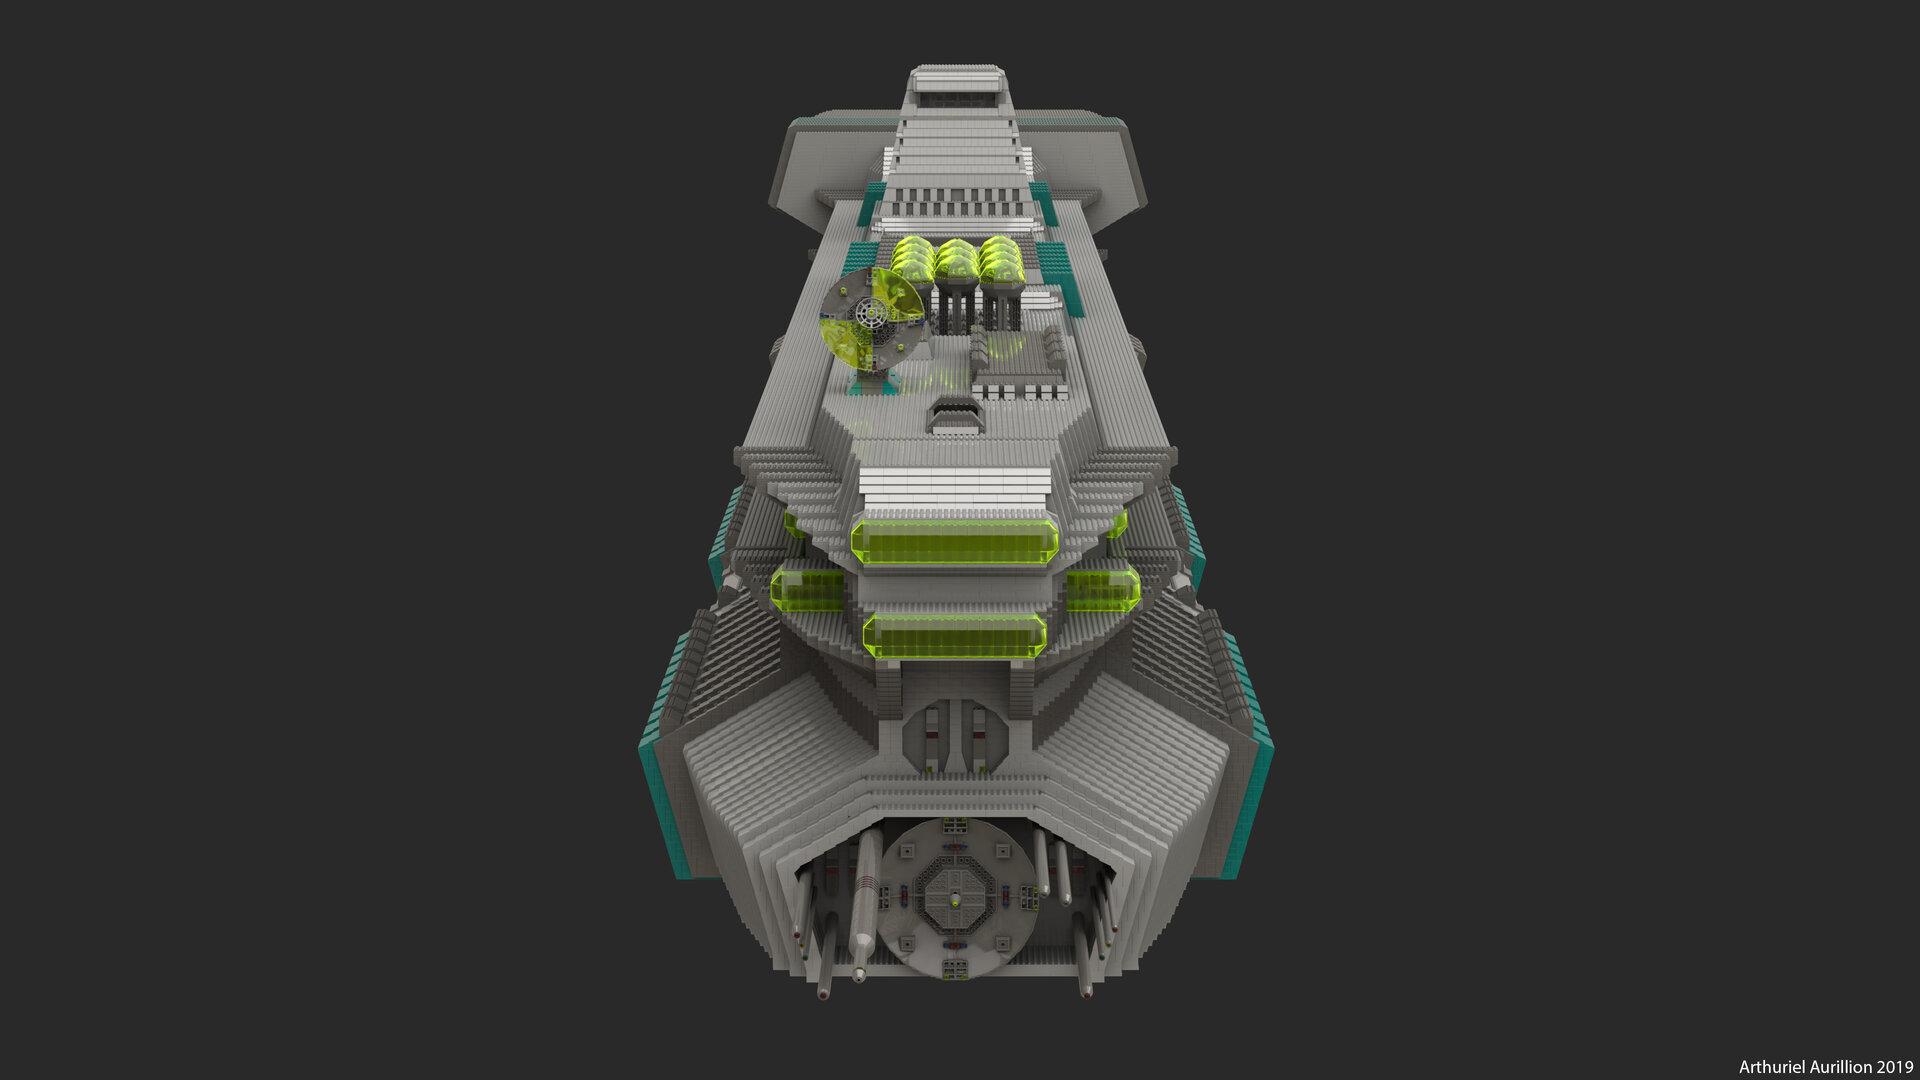 large.lms-explorer-stud-io-5.jpg.6686a6d2db55e22d2de672c7bc02166c.jpg